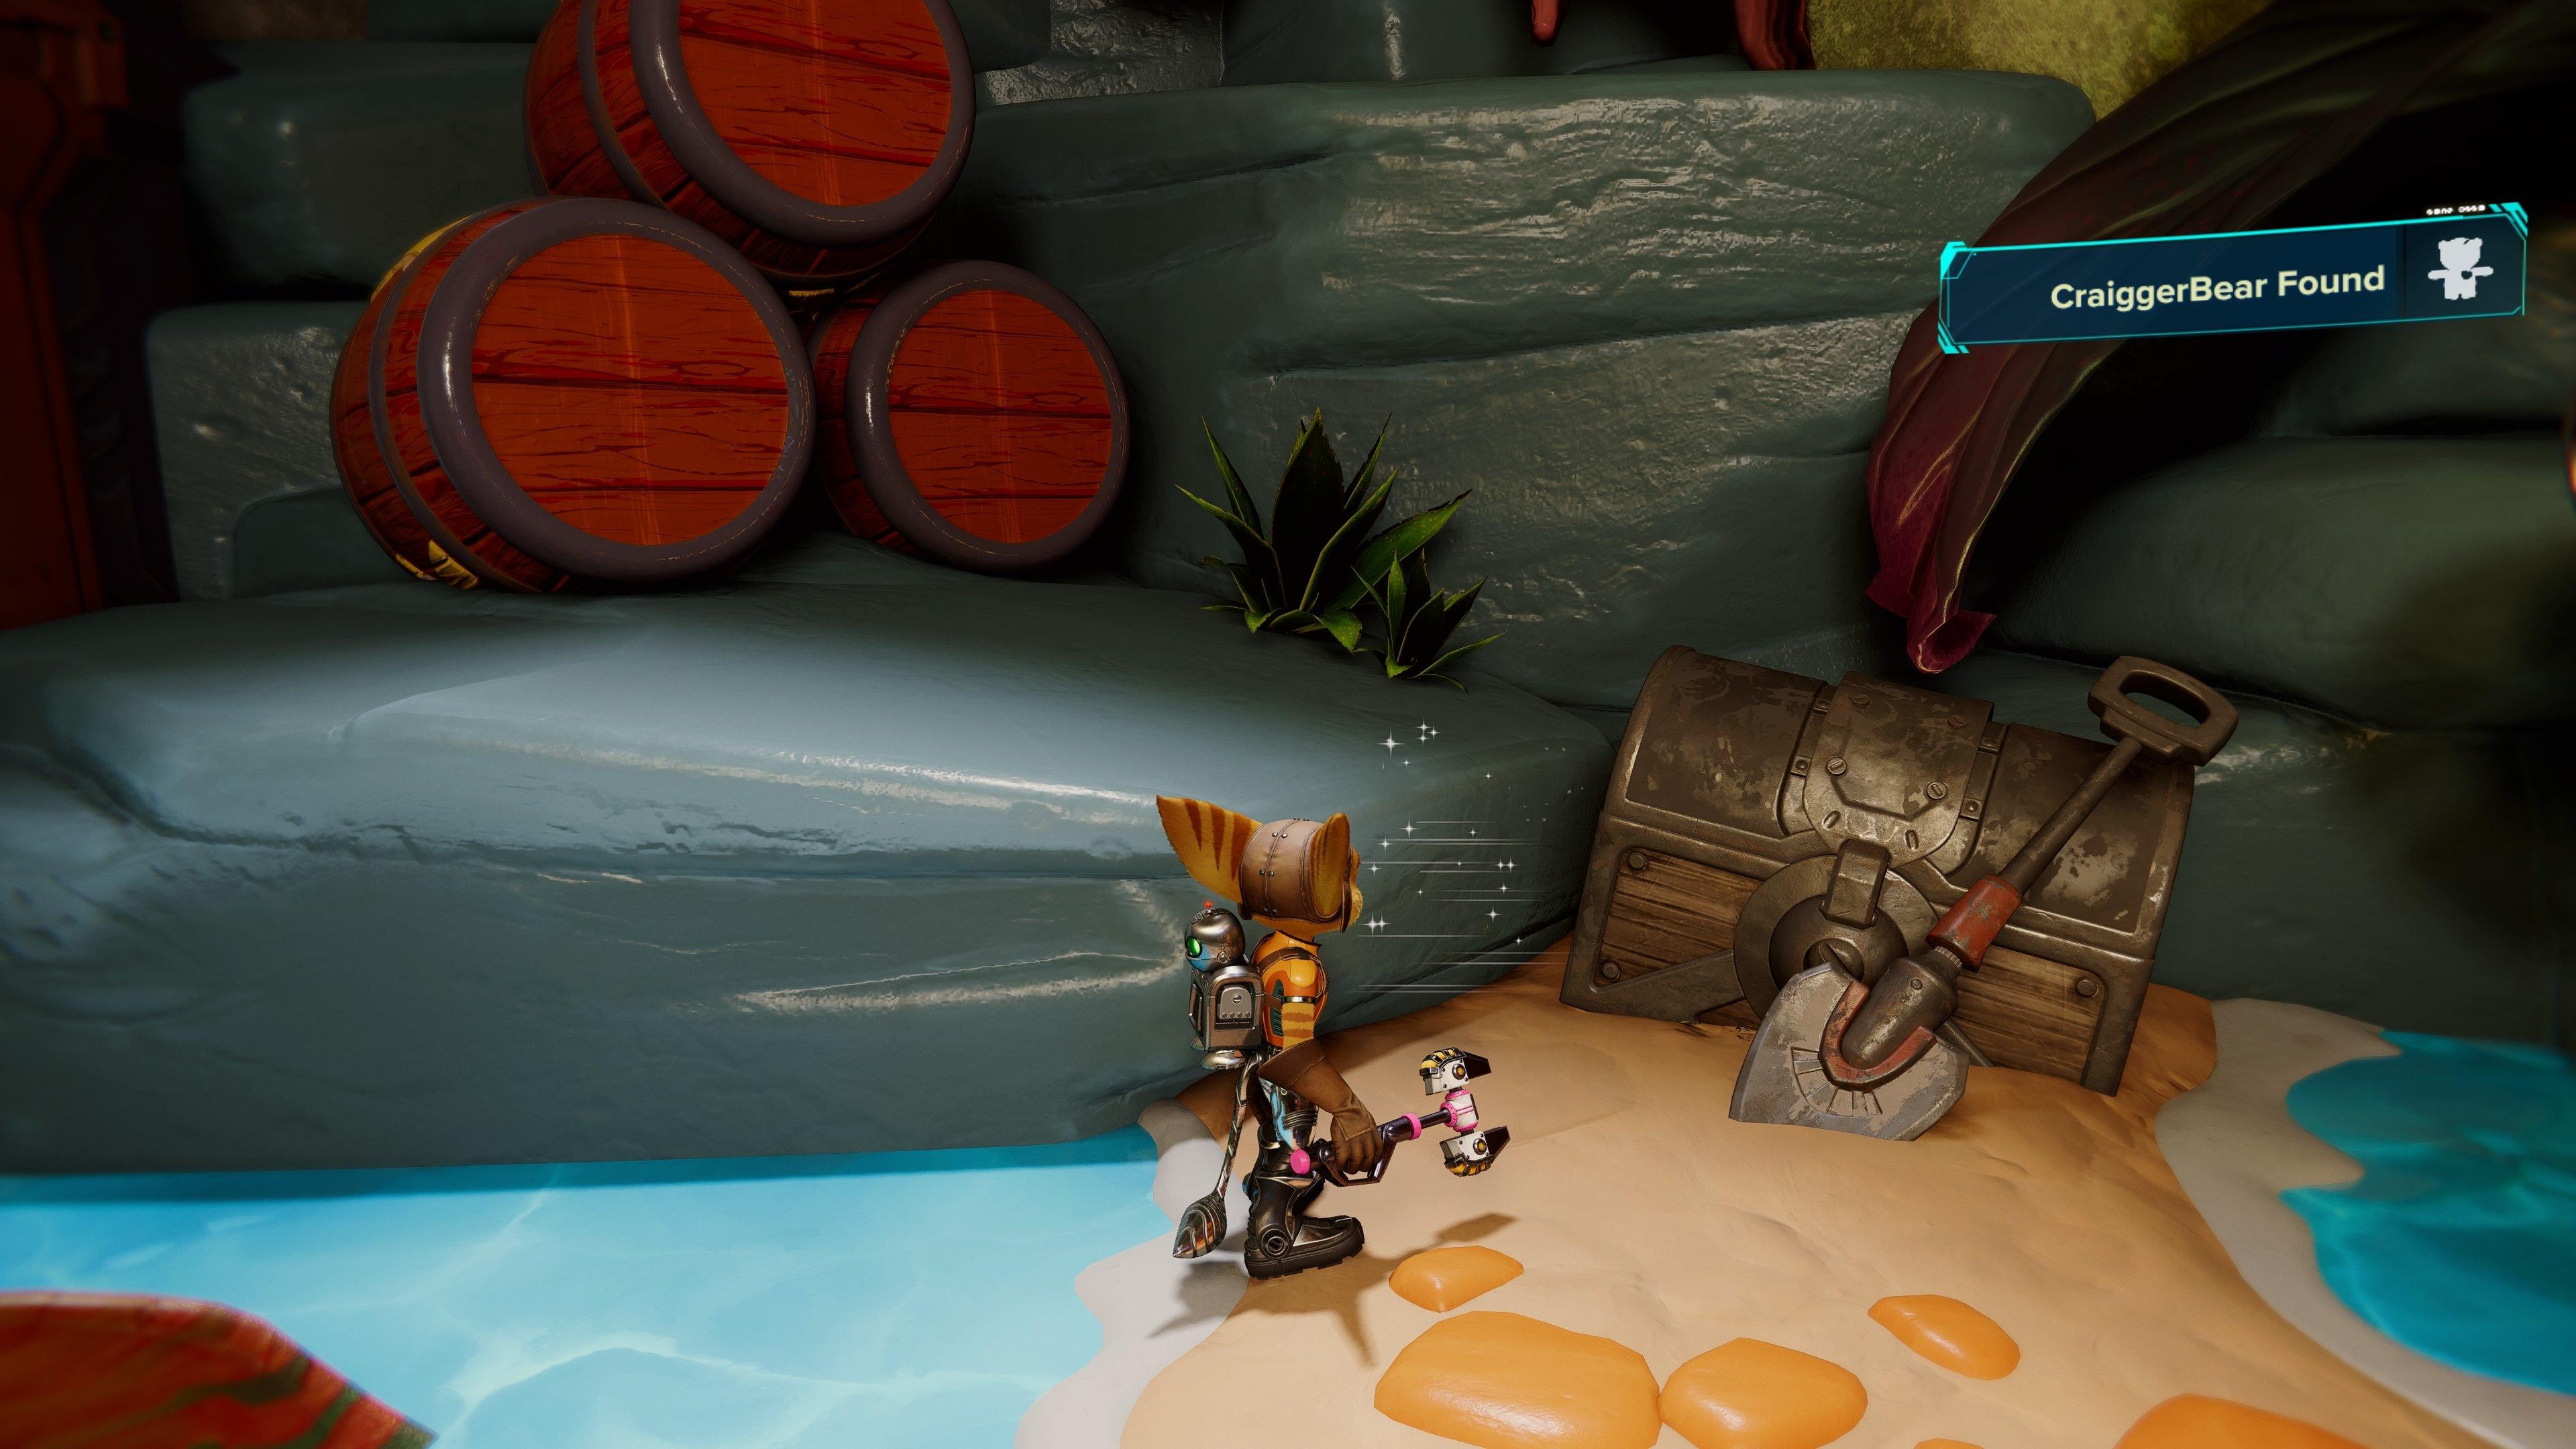 Ratchet and Clank: Rift Apart CraiggerBears Guide